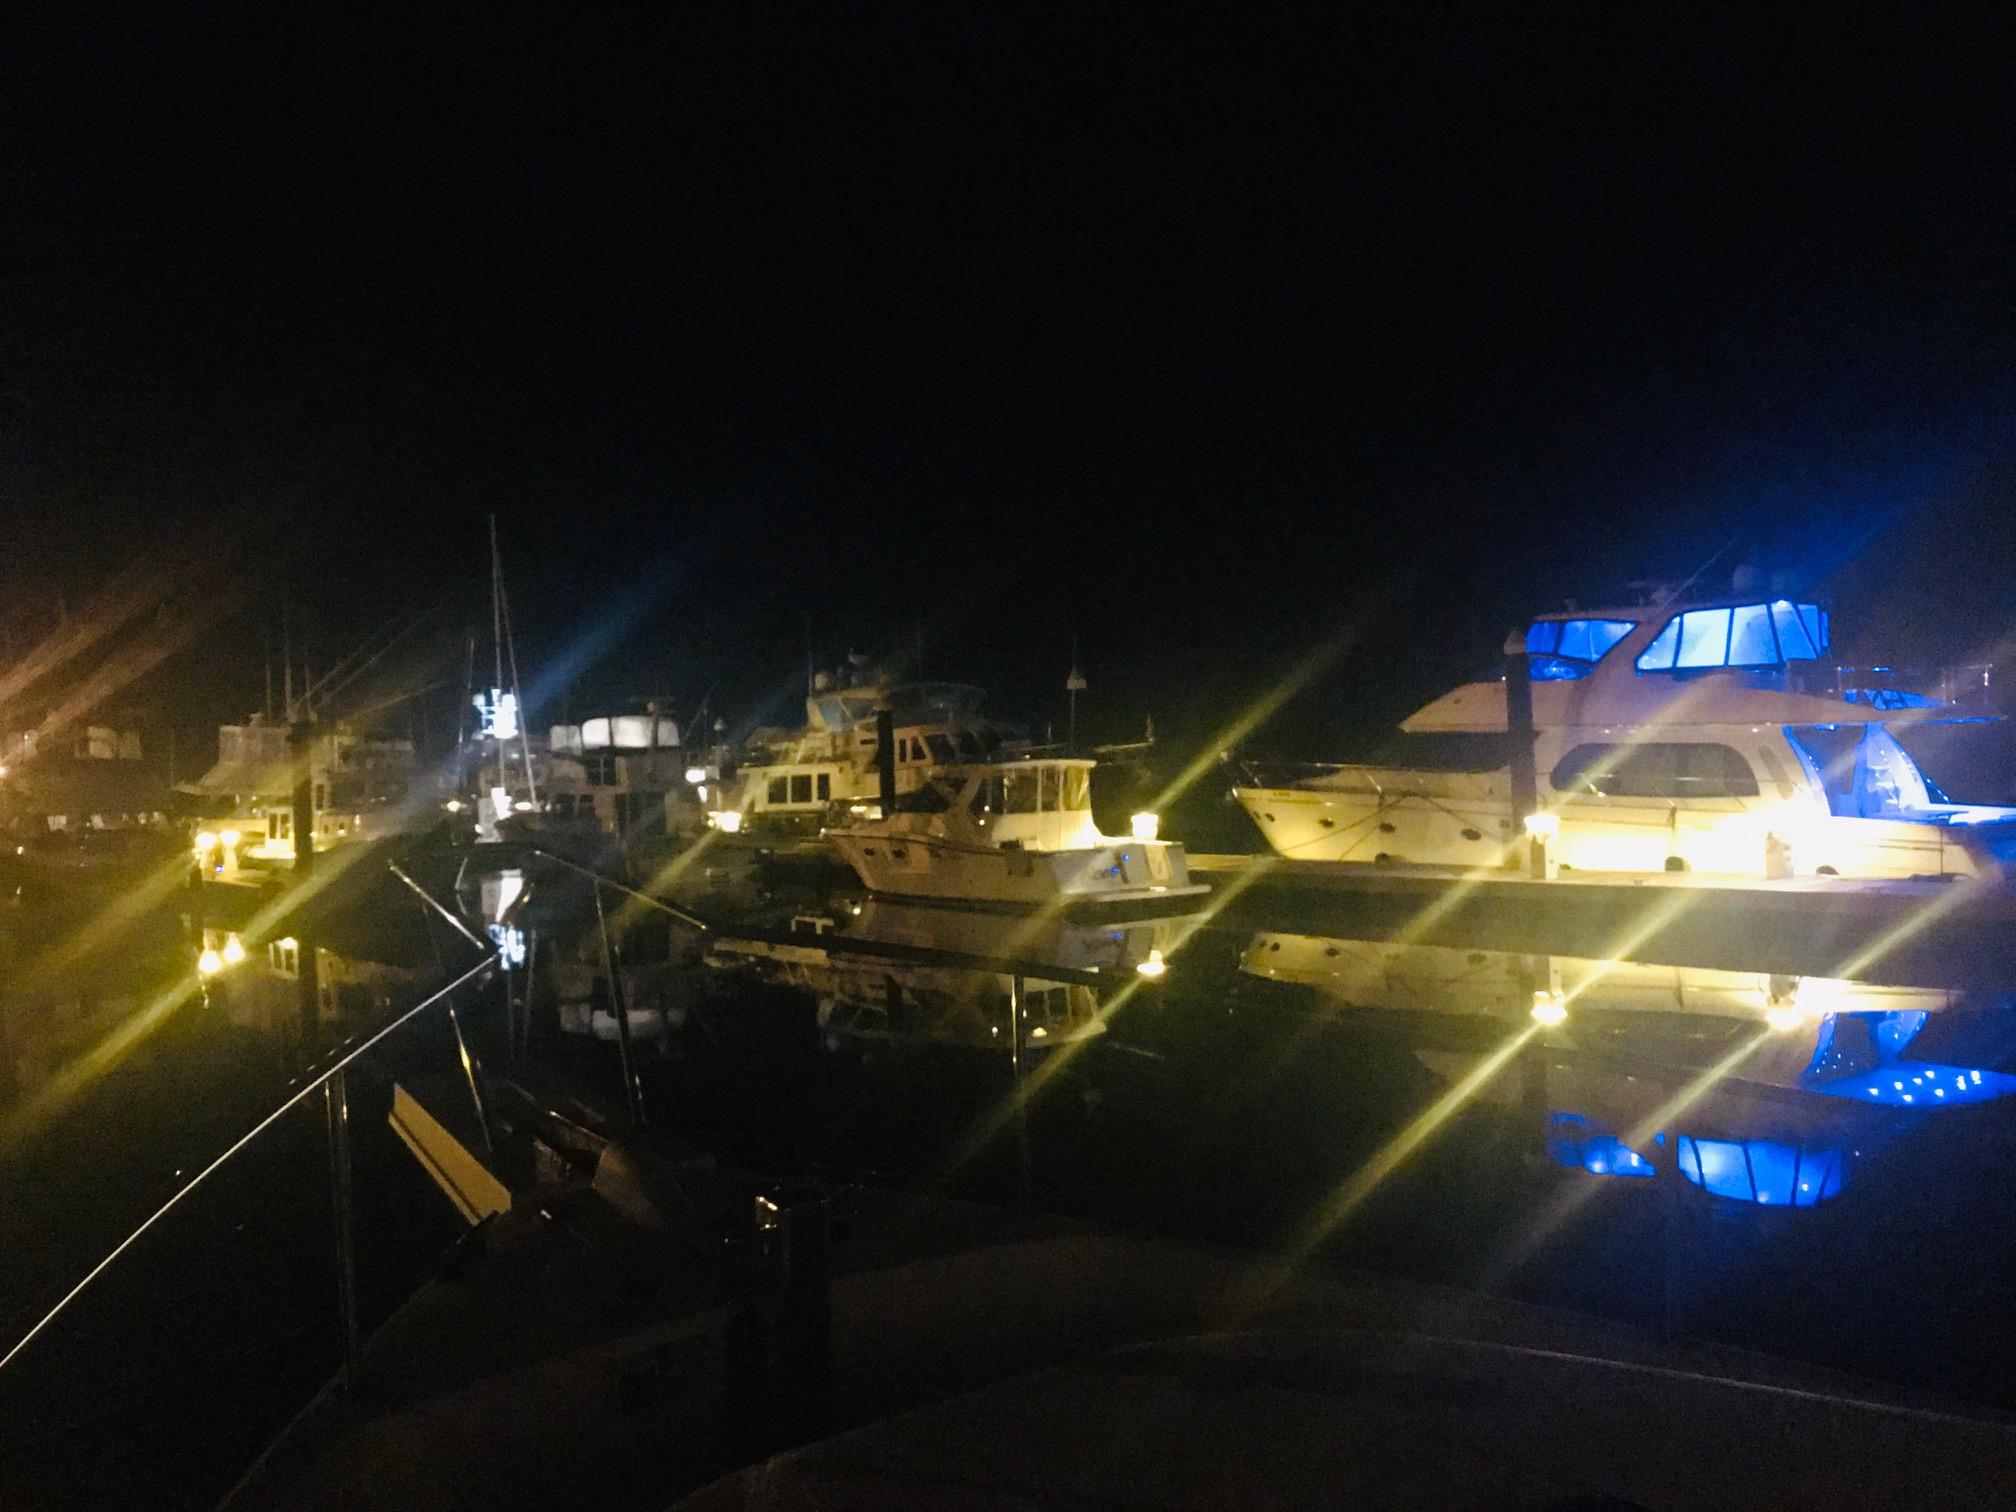 Nighttime at Harborwalk Marina